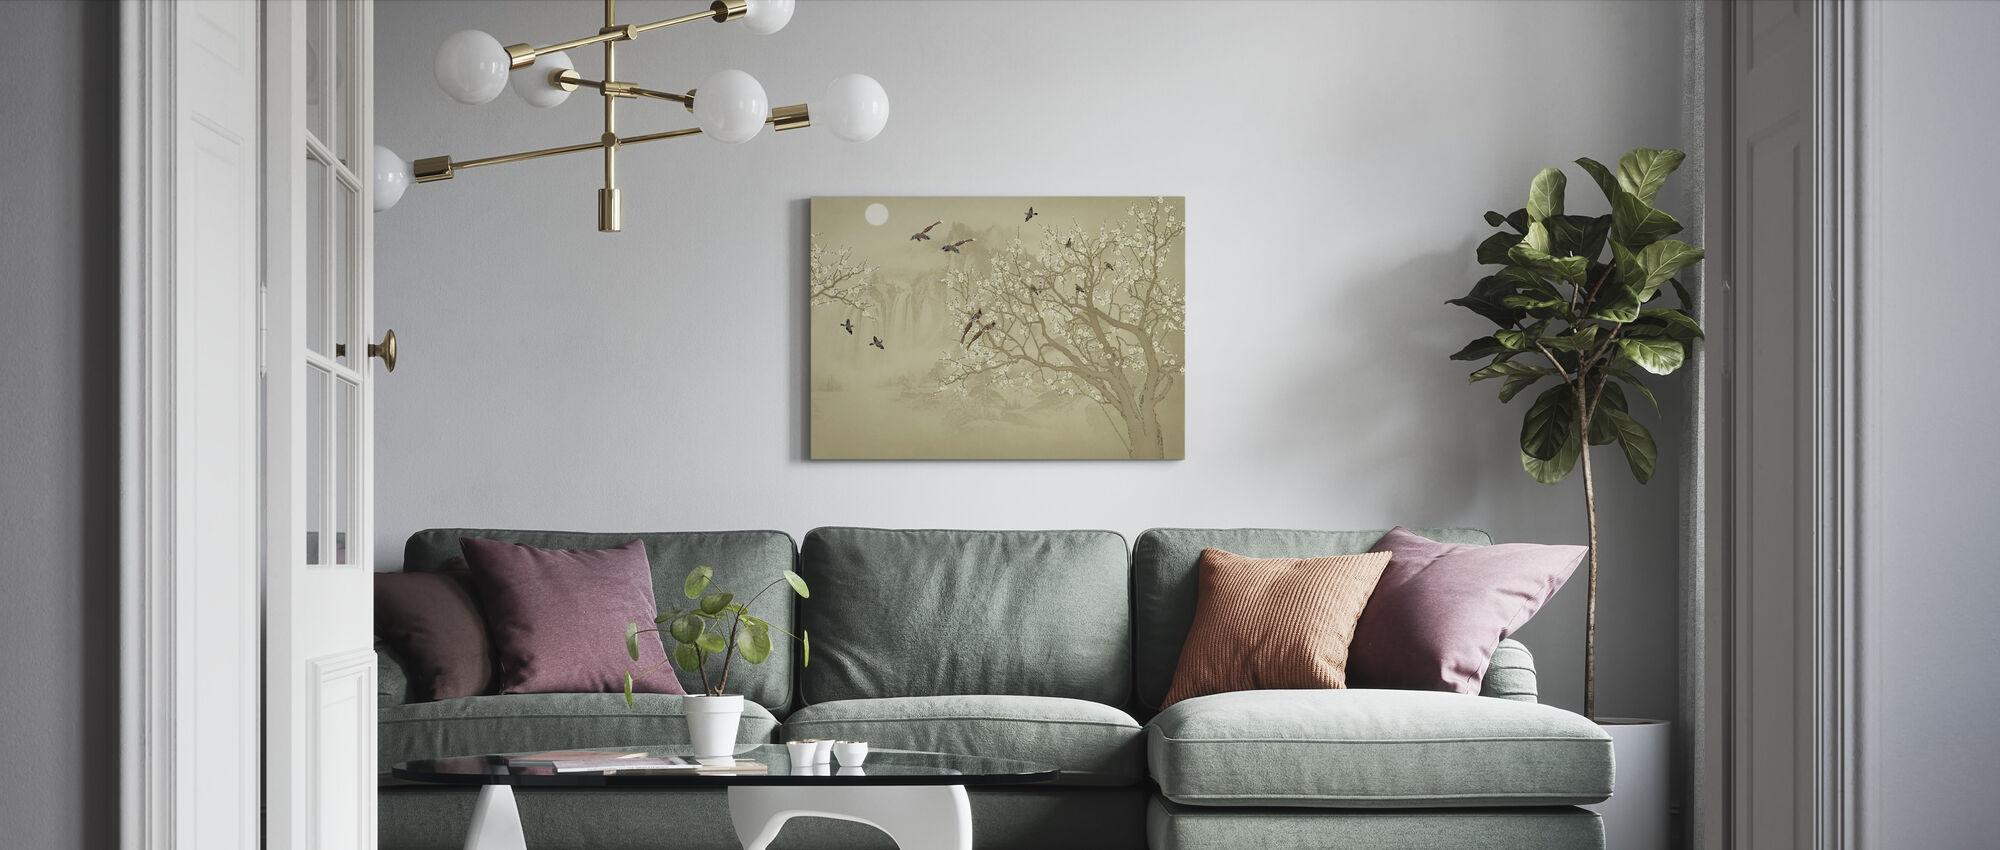 Birds Home - Hazel - Canvas print - Living Room